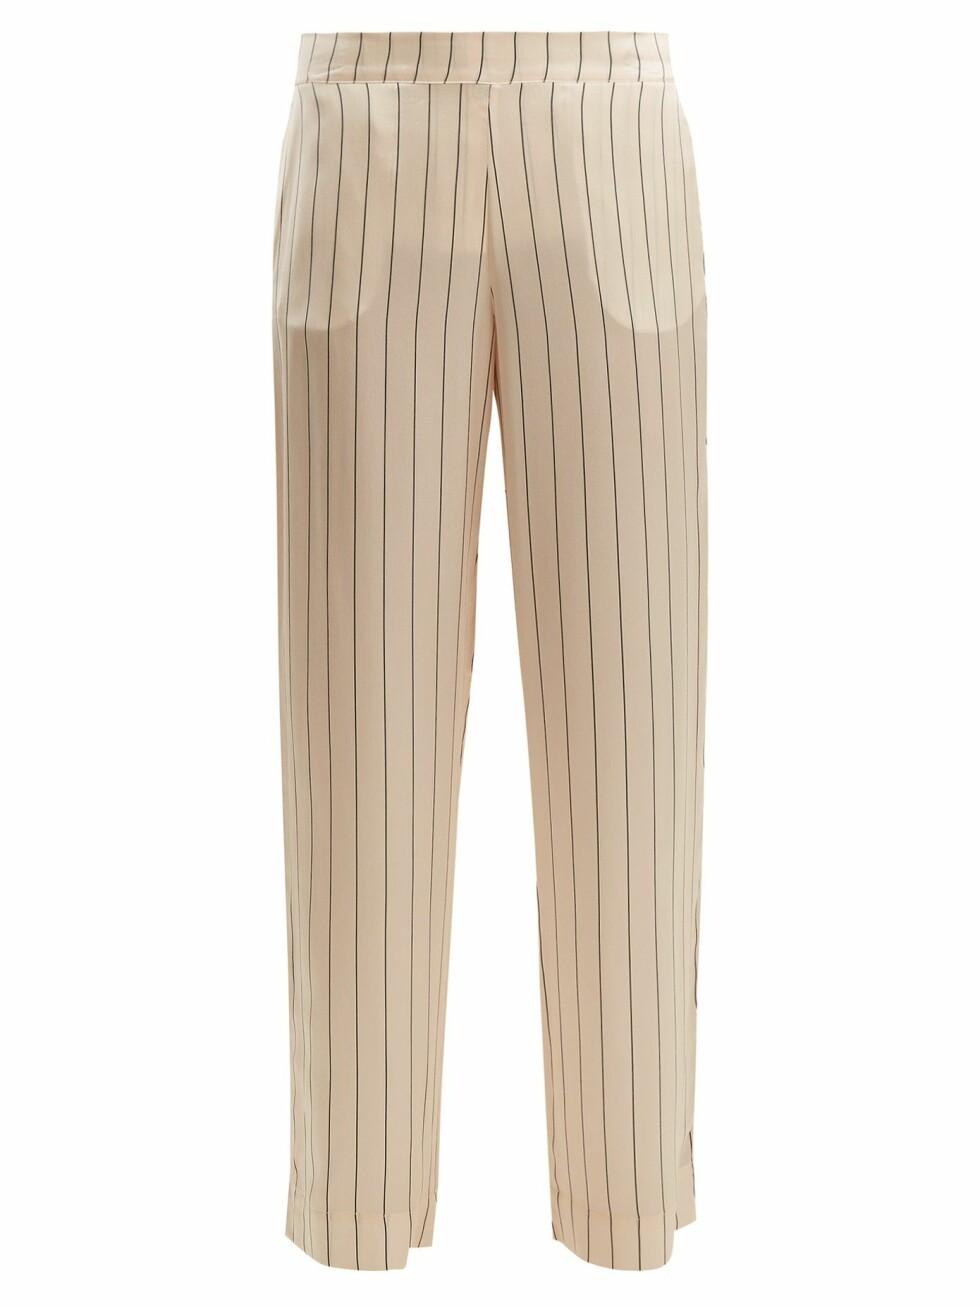 Bukse fra Asceno |1180,-| https://www.matchesfashion.com/intl/products/Asceno-Striped-silk-pyjama-trousers--1190165